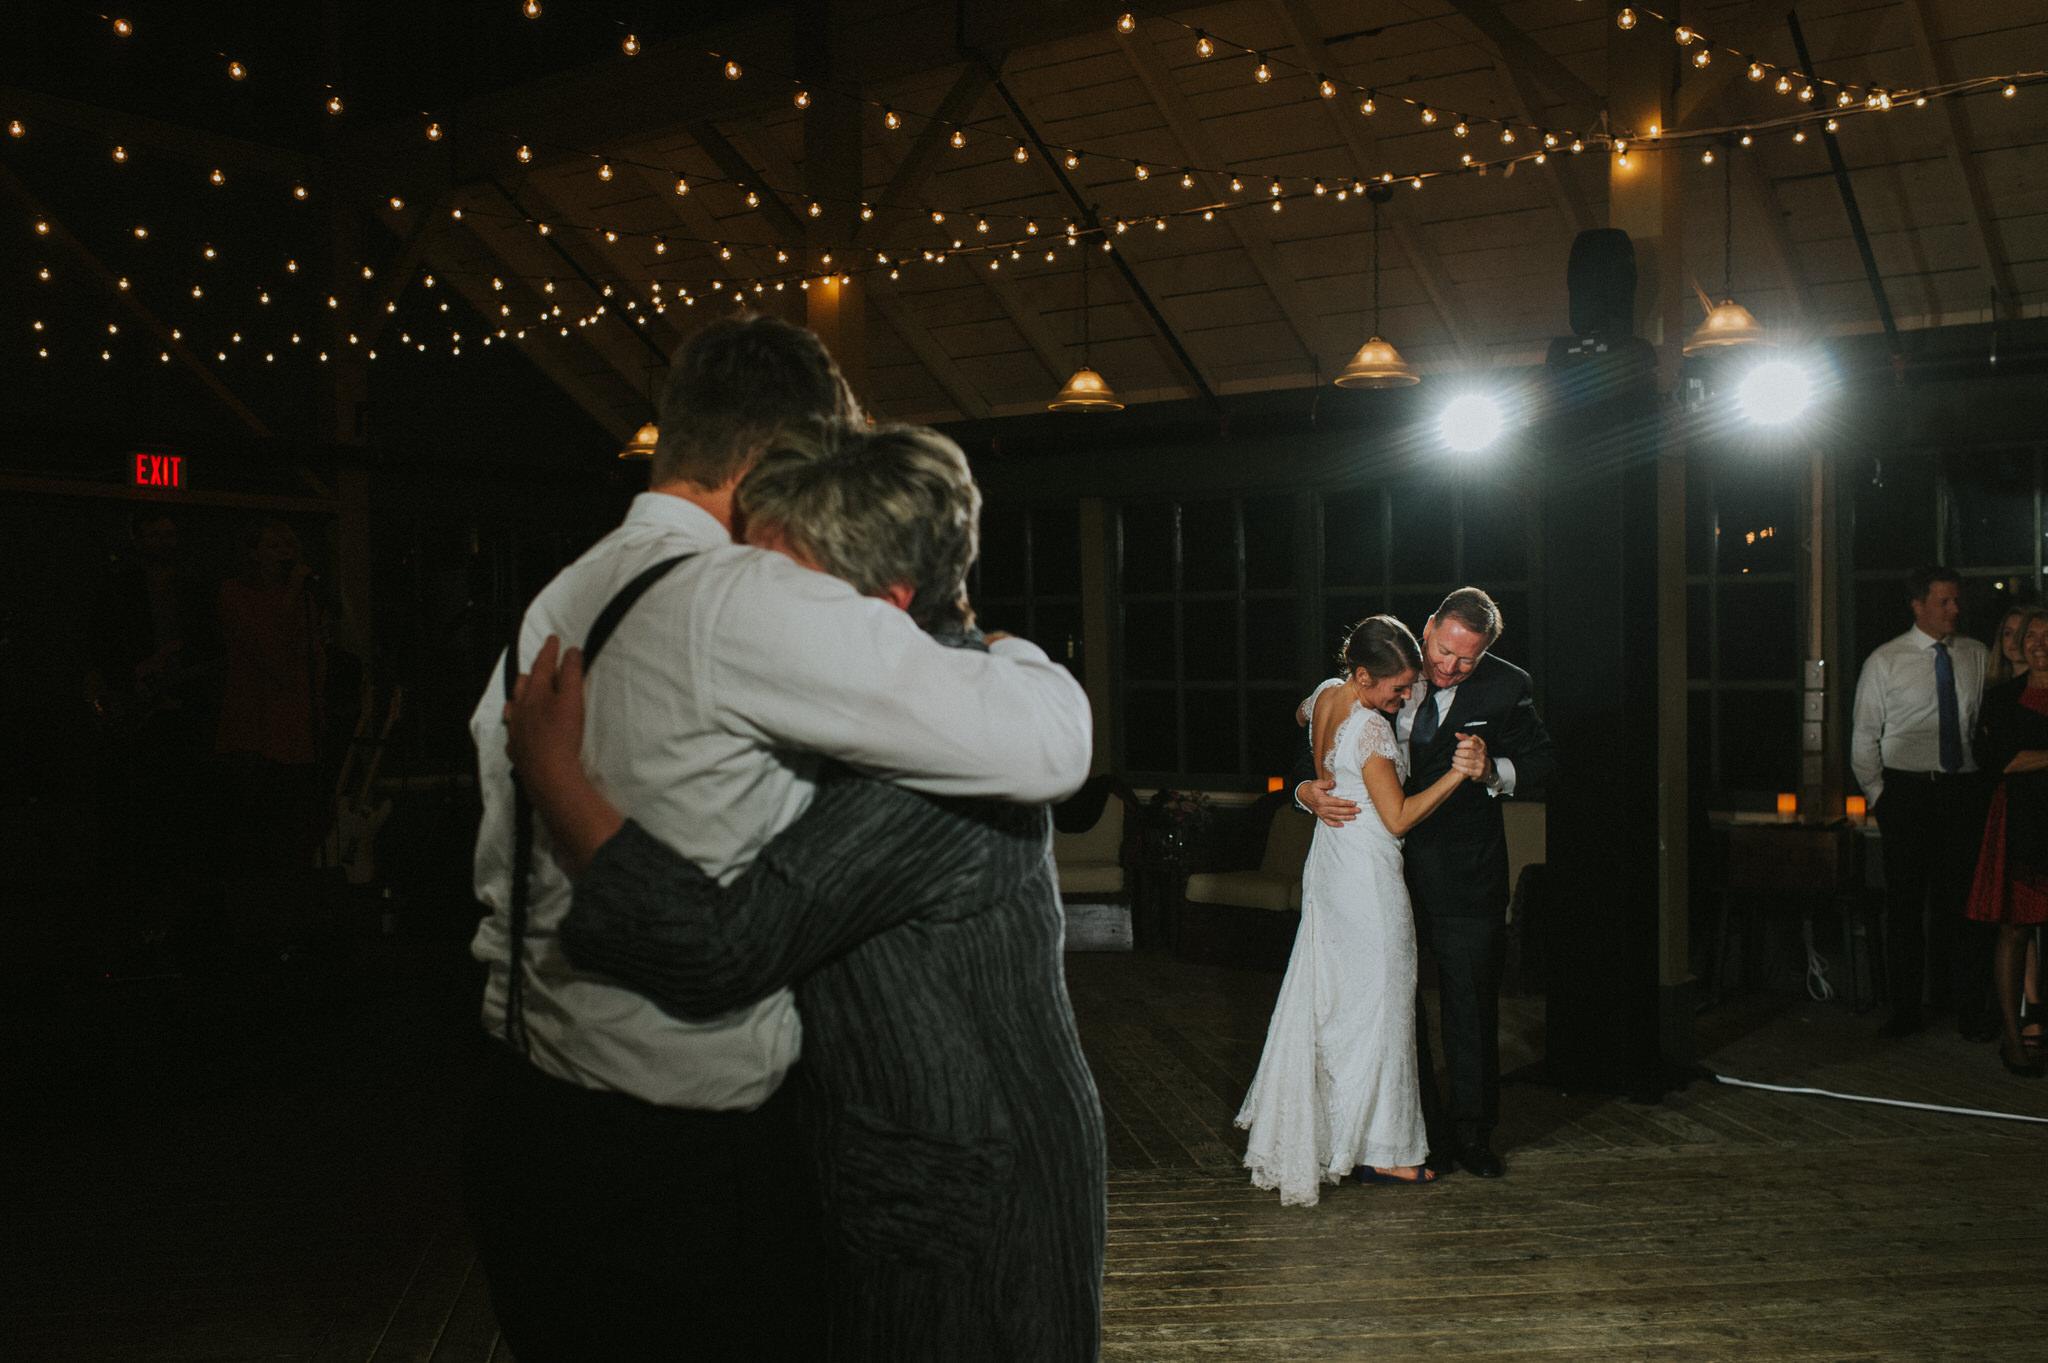 scarletoneillphotography_weddingphotography_prince edward county weddings177.JPG